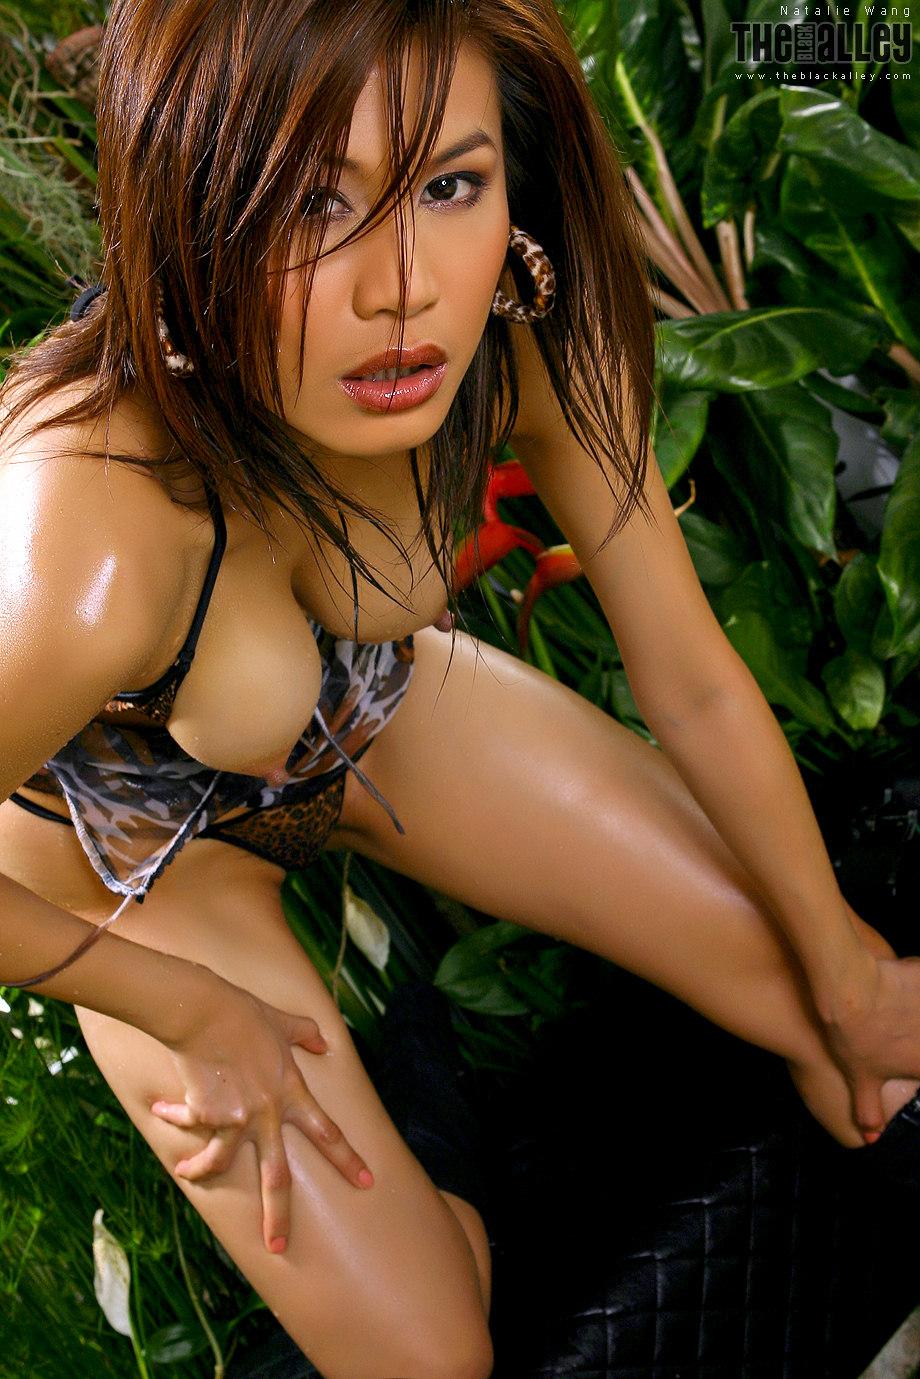 litu 100 archives: Natalie Wang Set 02